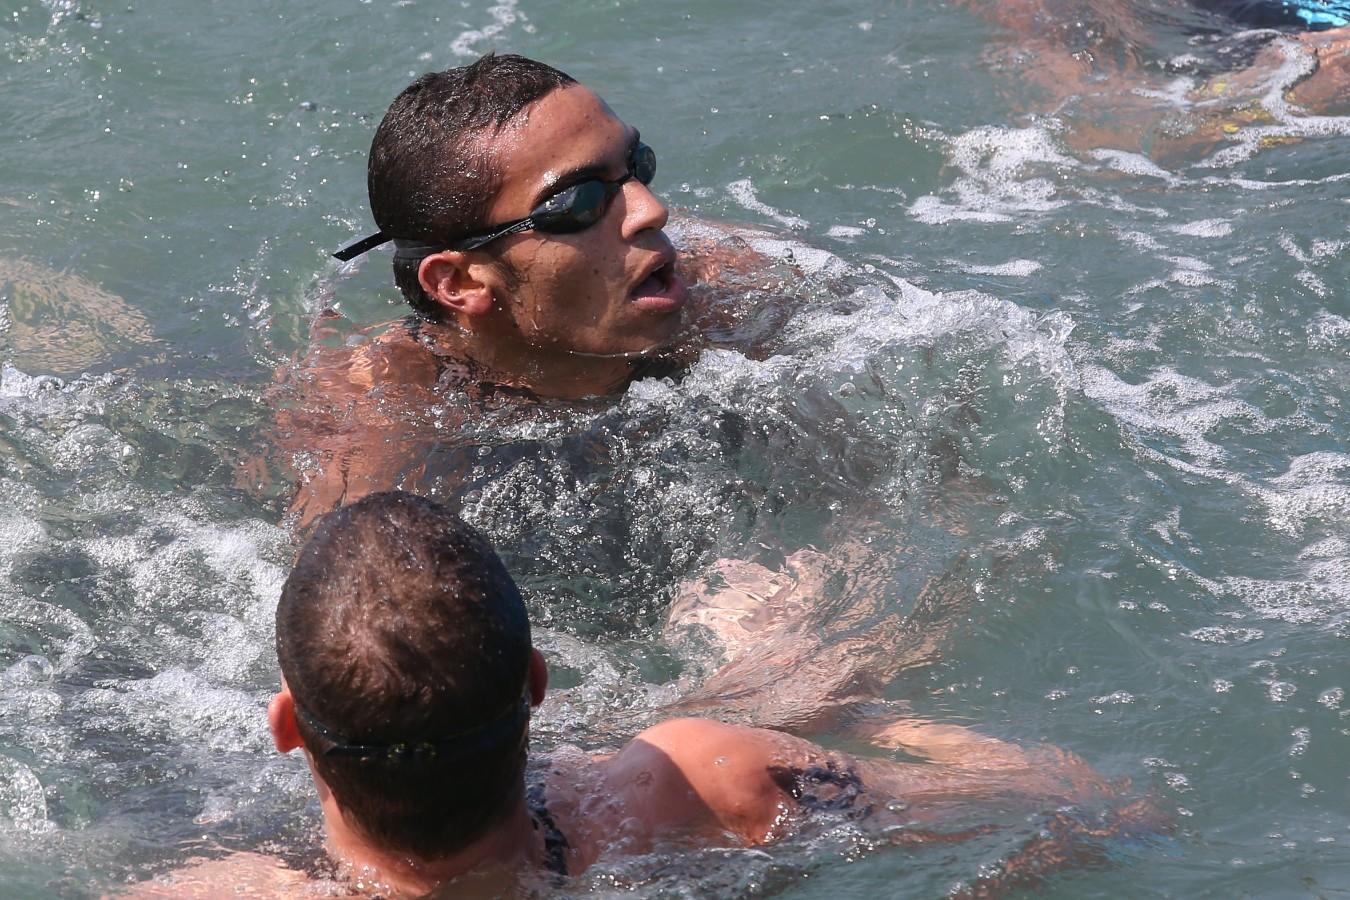 Allan do Carmo, Diogo Villarinho. Copa do Mundo de Maratonas Aquaticas, etapa Travessia de Hong Kong na Repulse Bay . 18 de Outubro de 2014, Hong Kong. Foto: Satiro Sodre/SSPress.